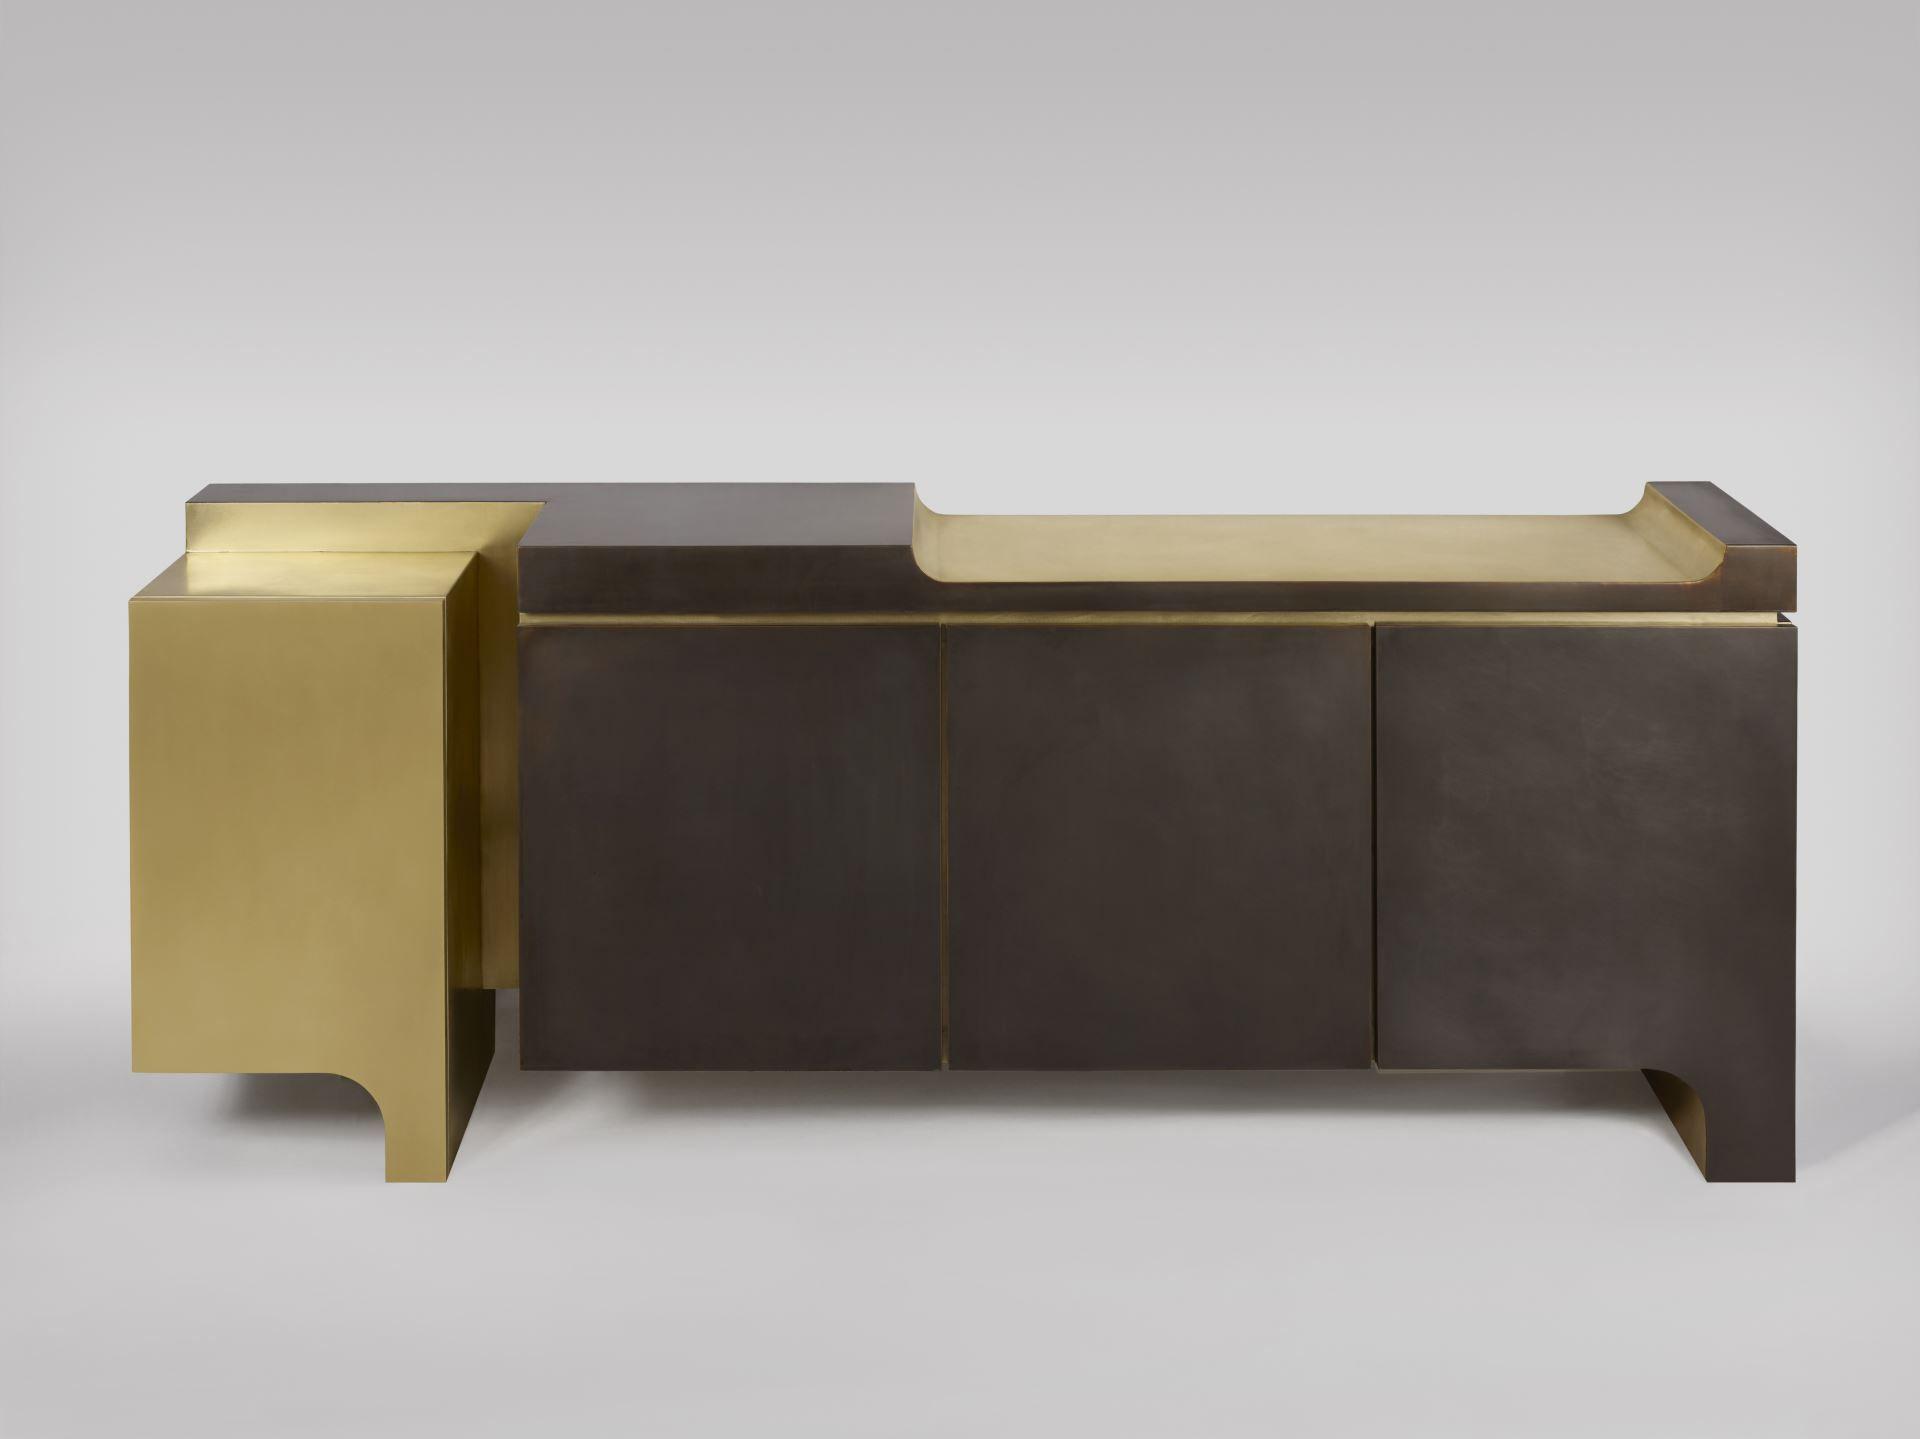 Galerie Bsl Xiangsheng Ii Cabinet Mobilier Mobilier De Luxe Mobilier Design